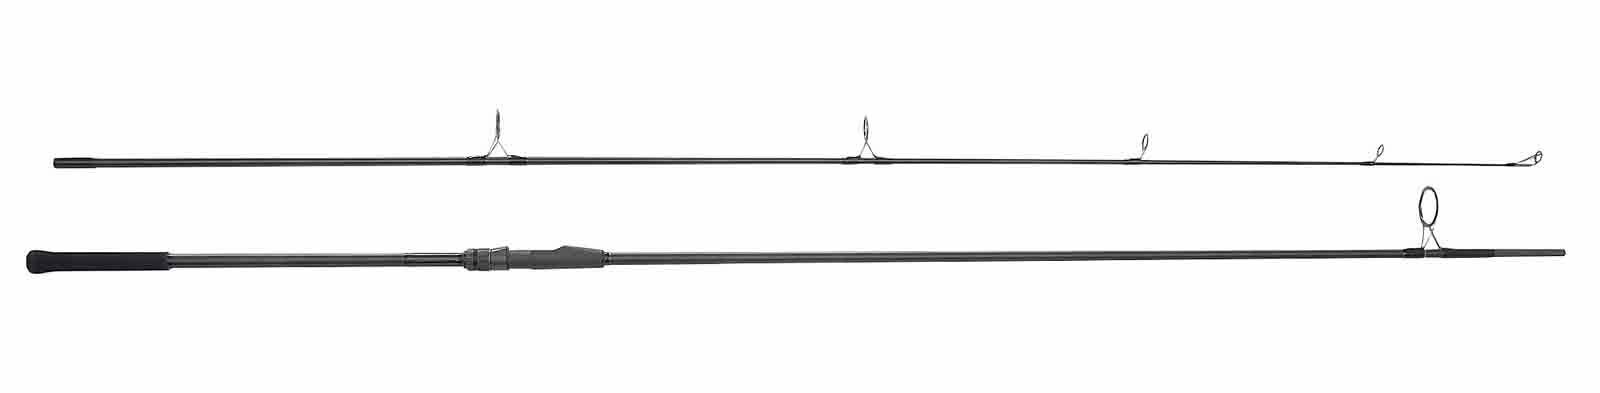 Greys GT 13ft  Extreme XSM Spod Marker Casting Spod   Floats Carp Fishing Rod  discount sale